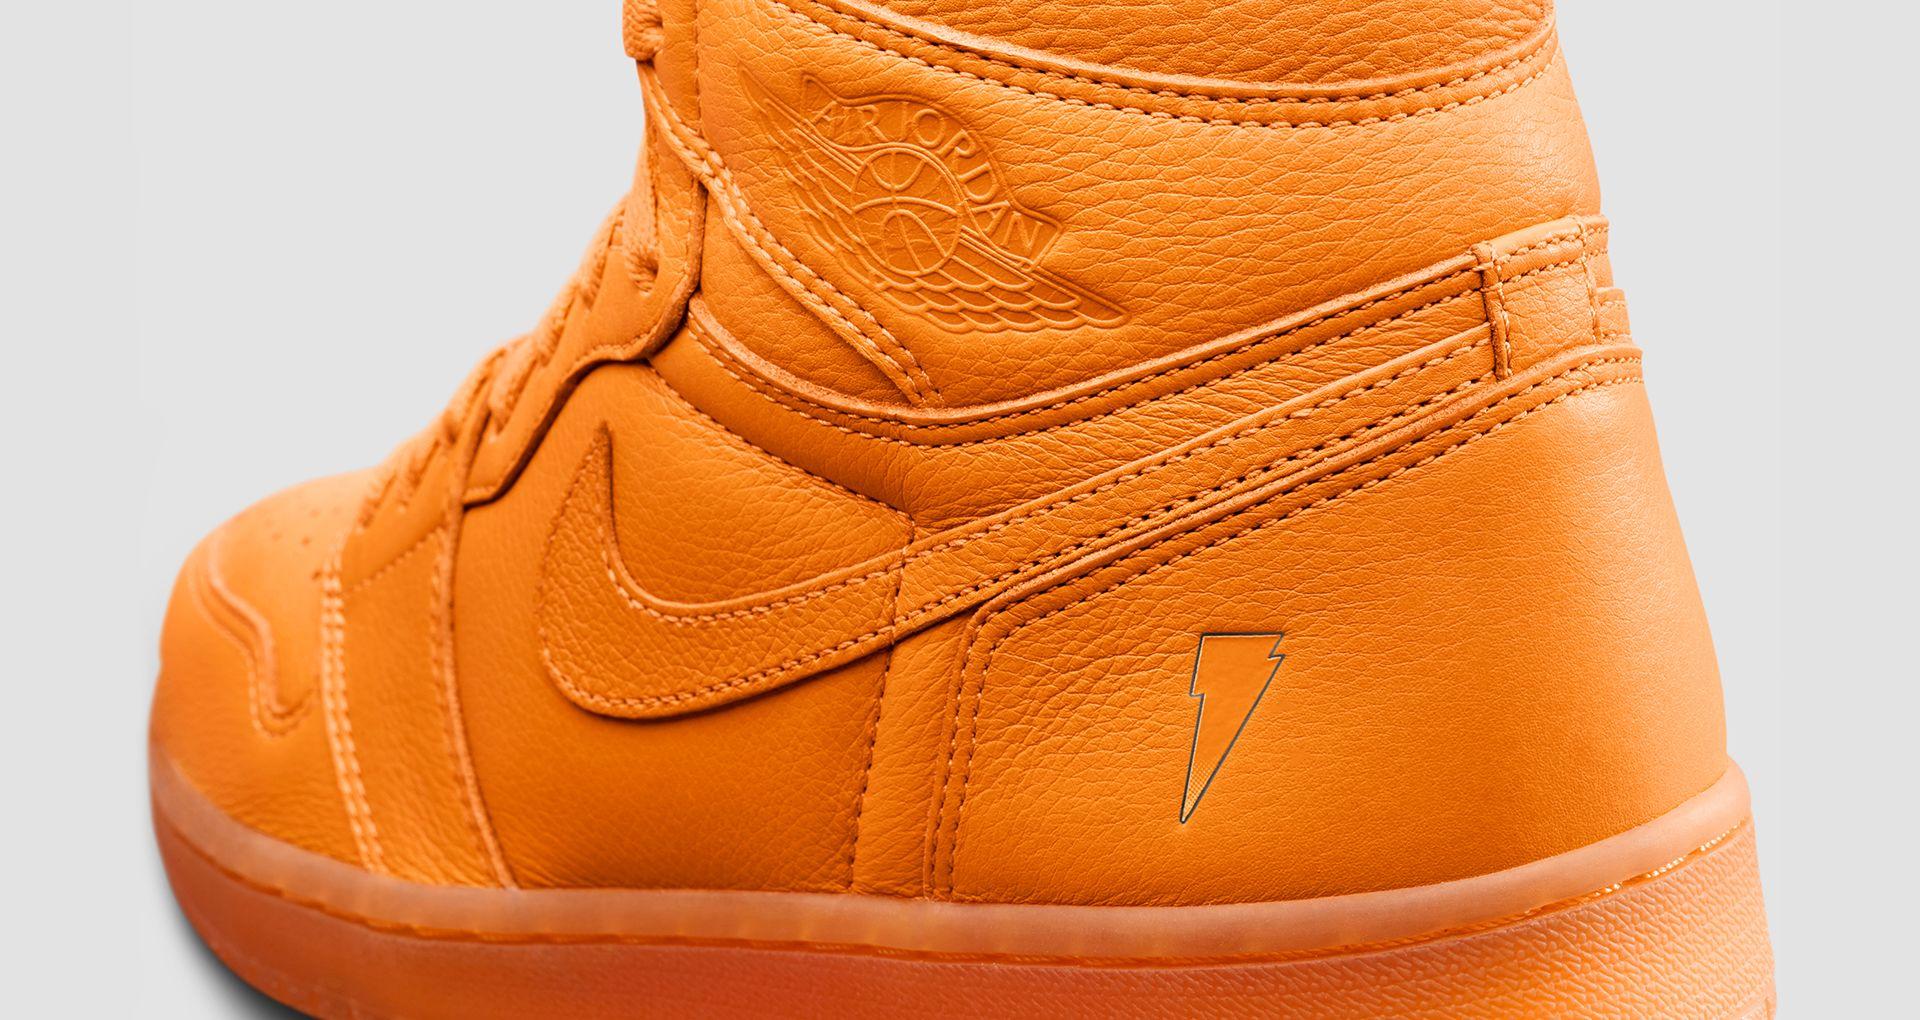 buy popular badc9 cc9af Behind The Design: Air Jordan 1 Gatorade 'Orange'. Nike+ SNKRS